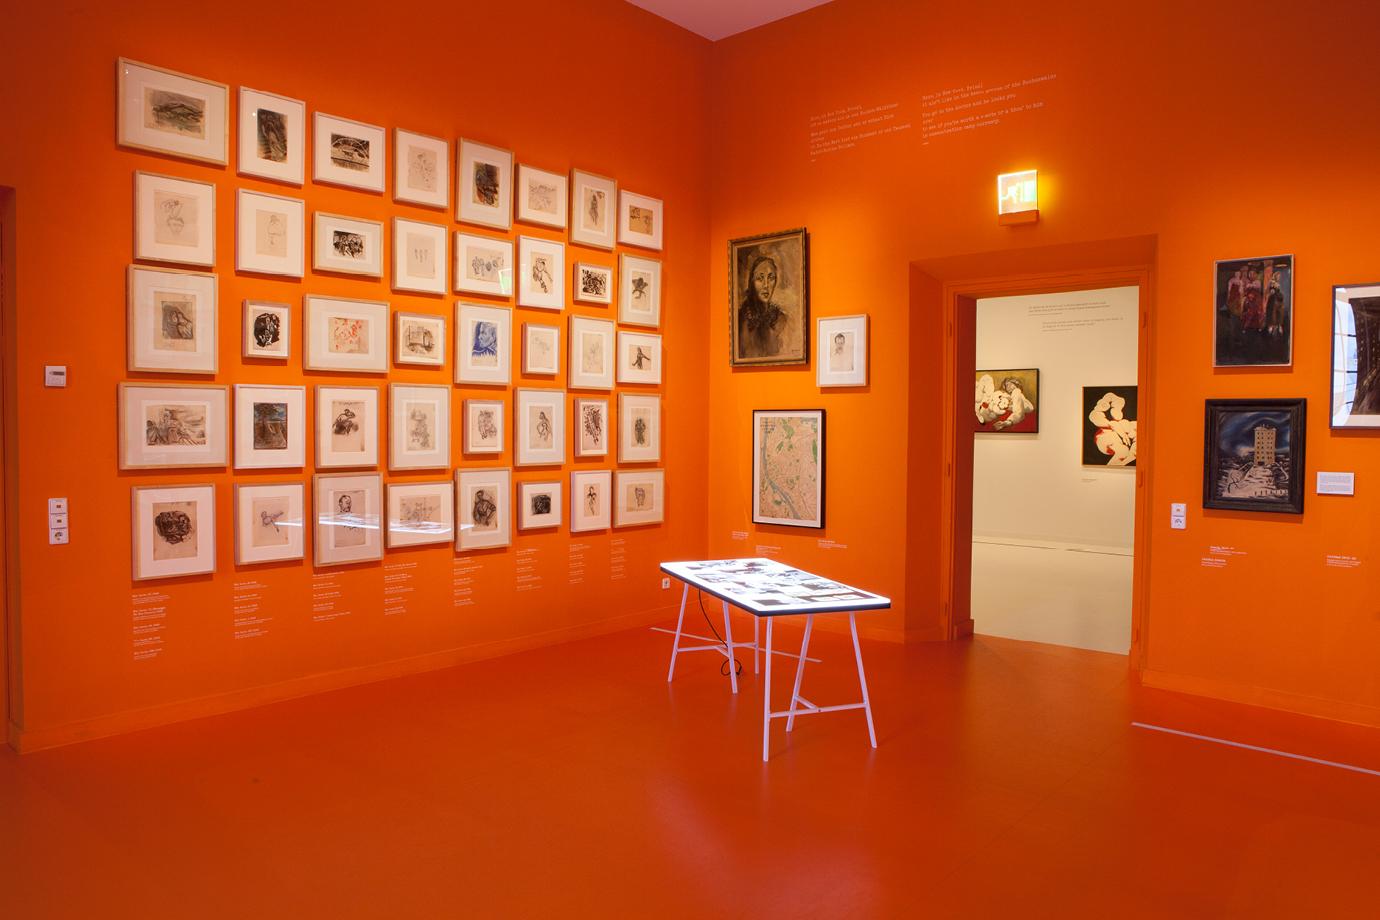 http://e-o-t.de/wordpress/wp-content/uploads/2017/03/Slide-Exhibition_Lurie_6.jpg